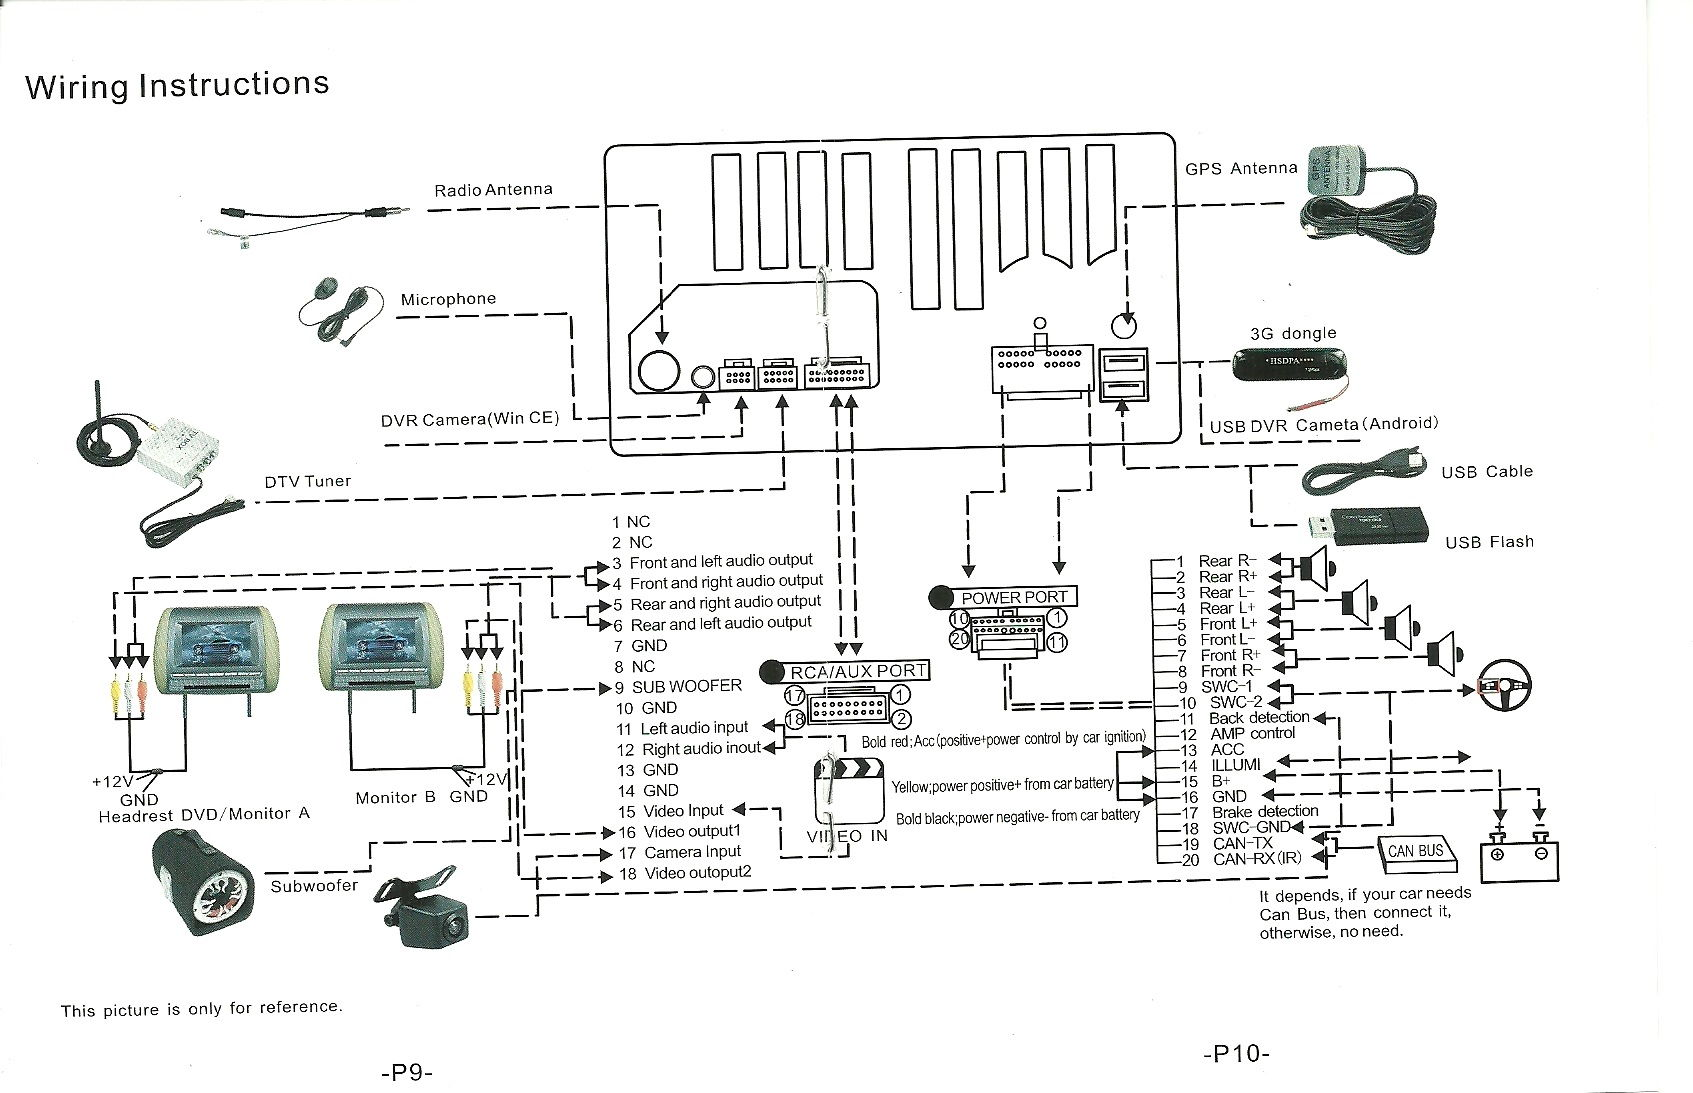 1997 f250 wiring diagram door head unit question - page 3 - mbworld.org forums fdas wiring diagram #5